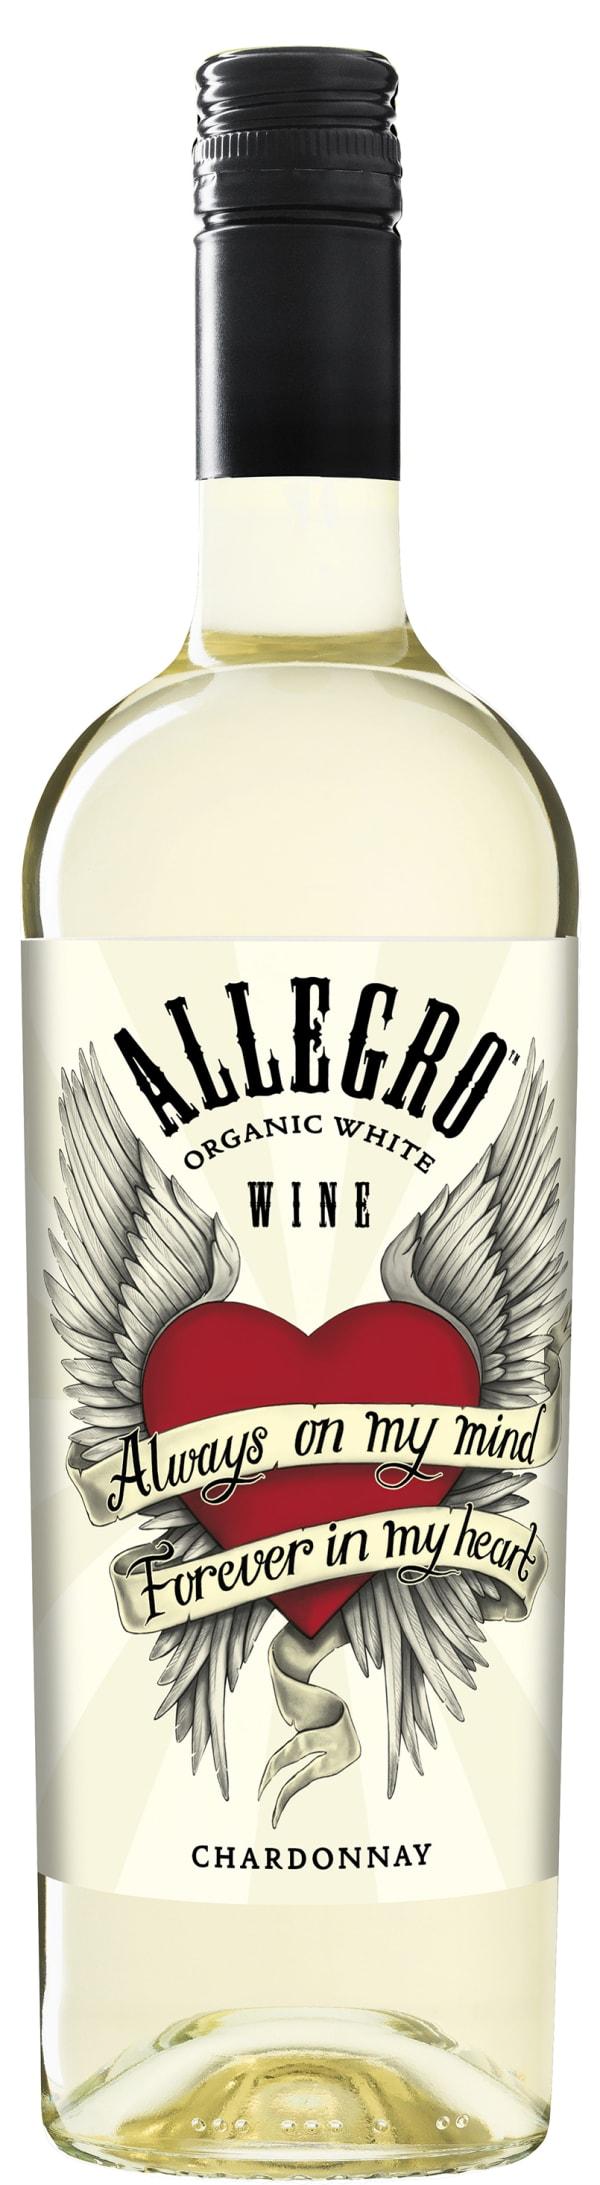 Allegro Organic Chardonnay 2015